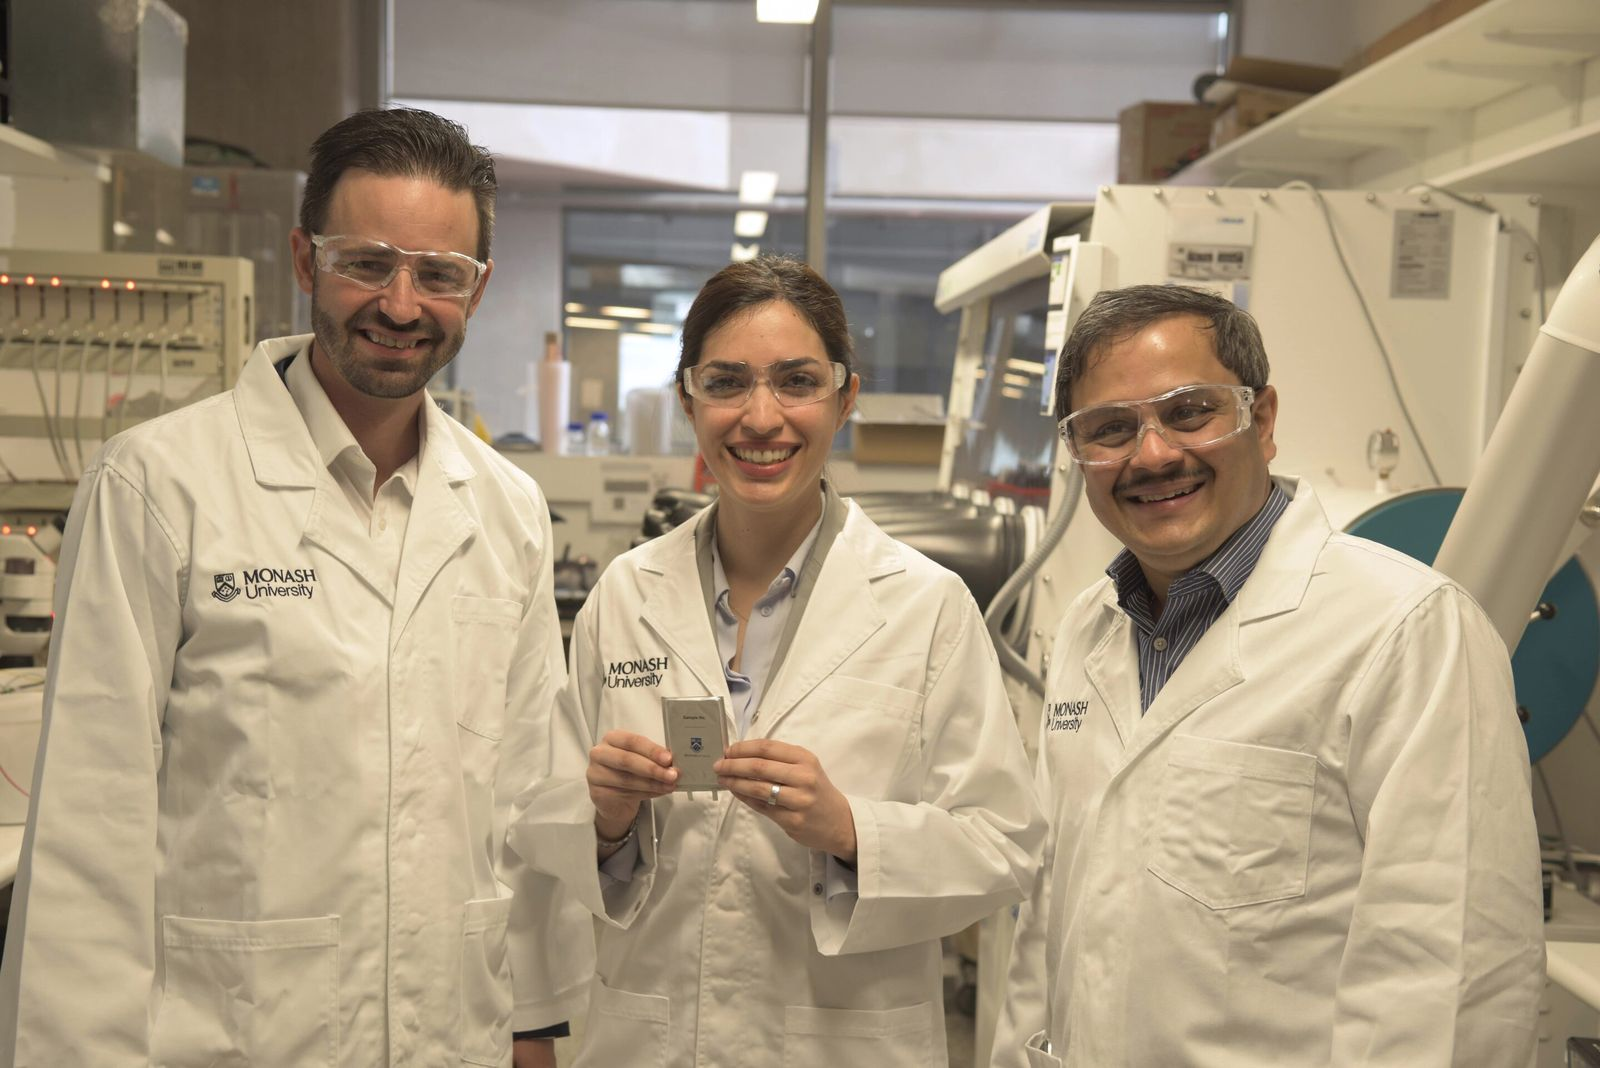 Neue Lithium Batterie/ Test/ Australien/ Monash University